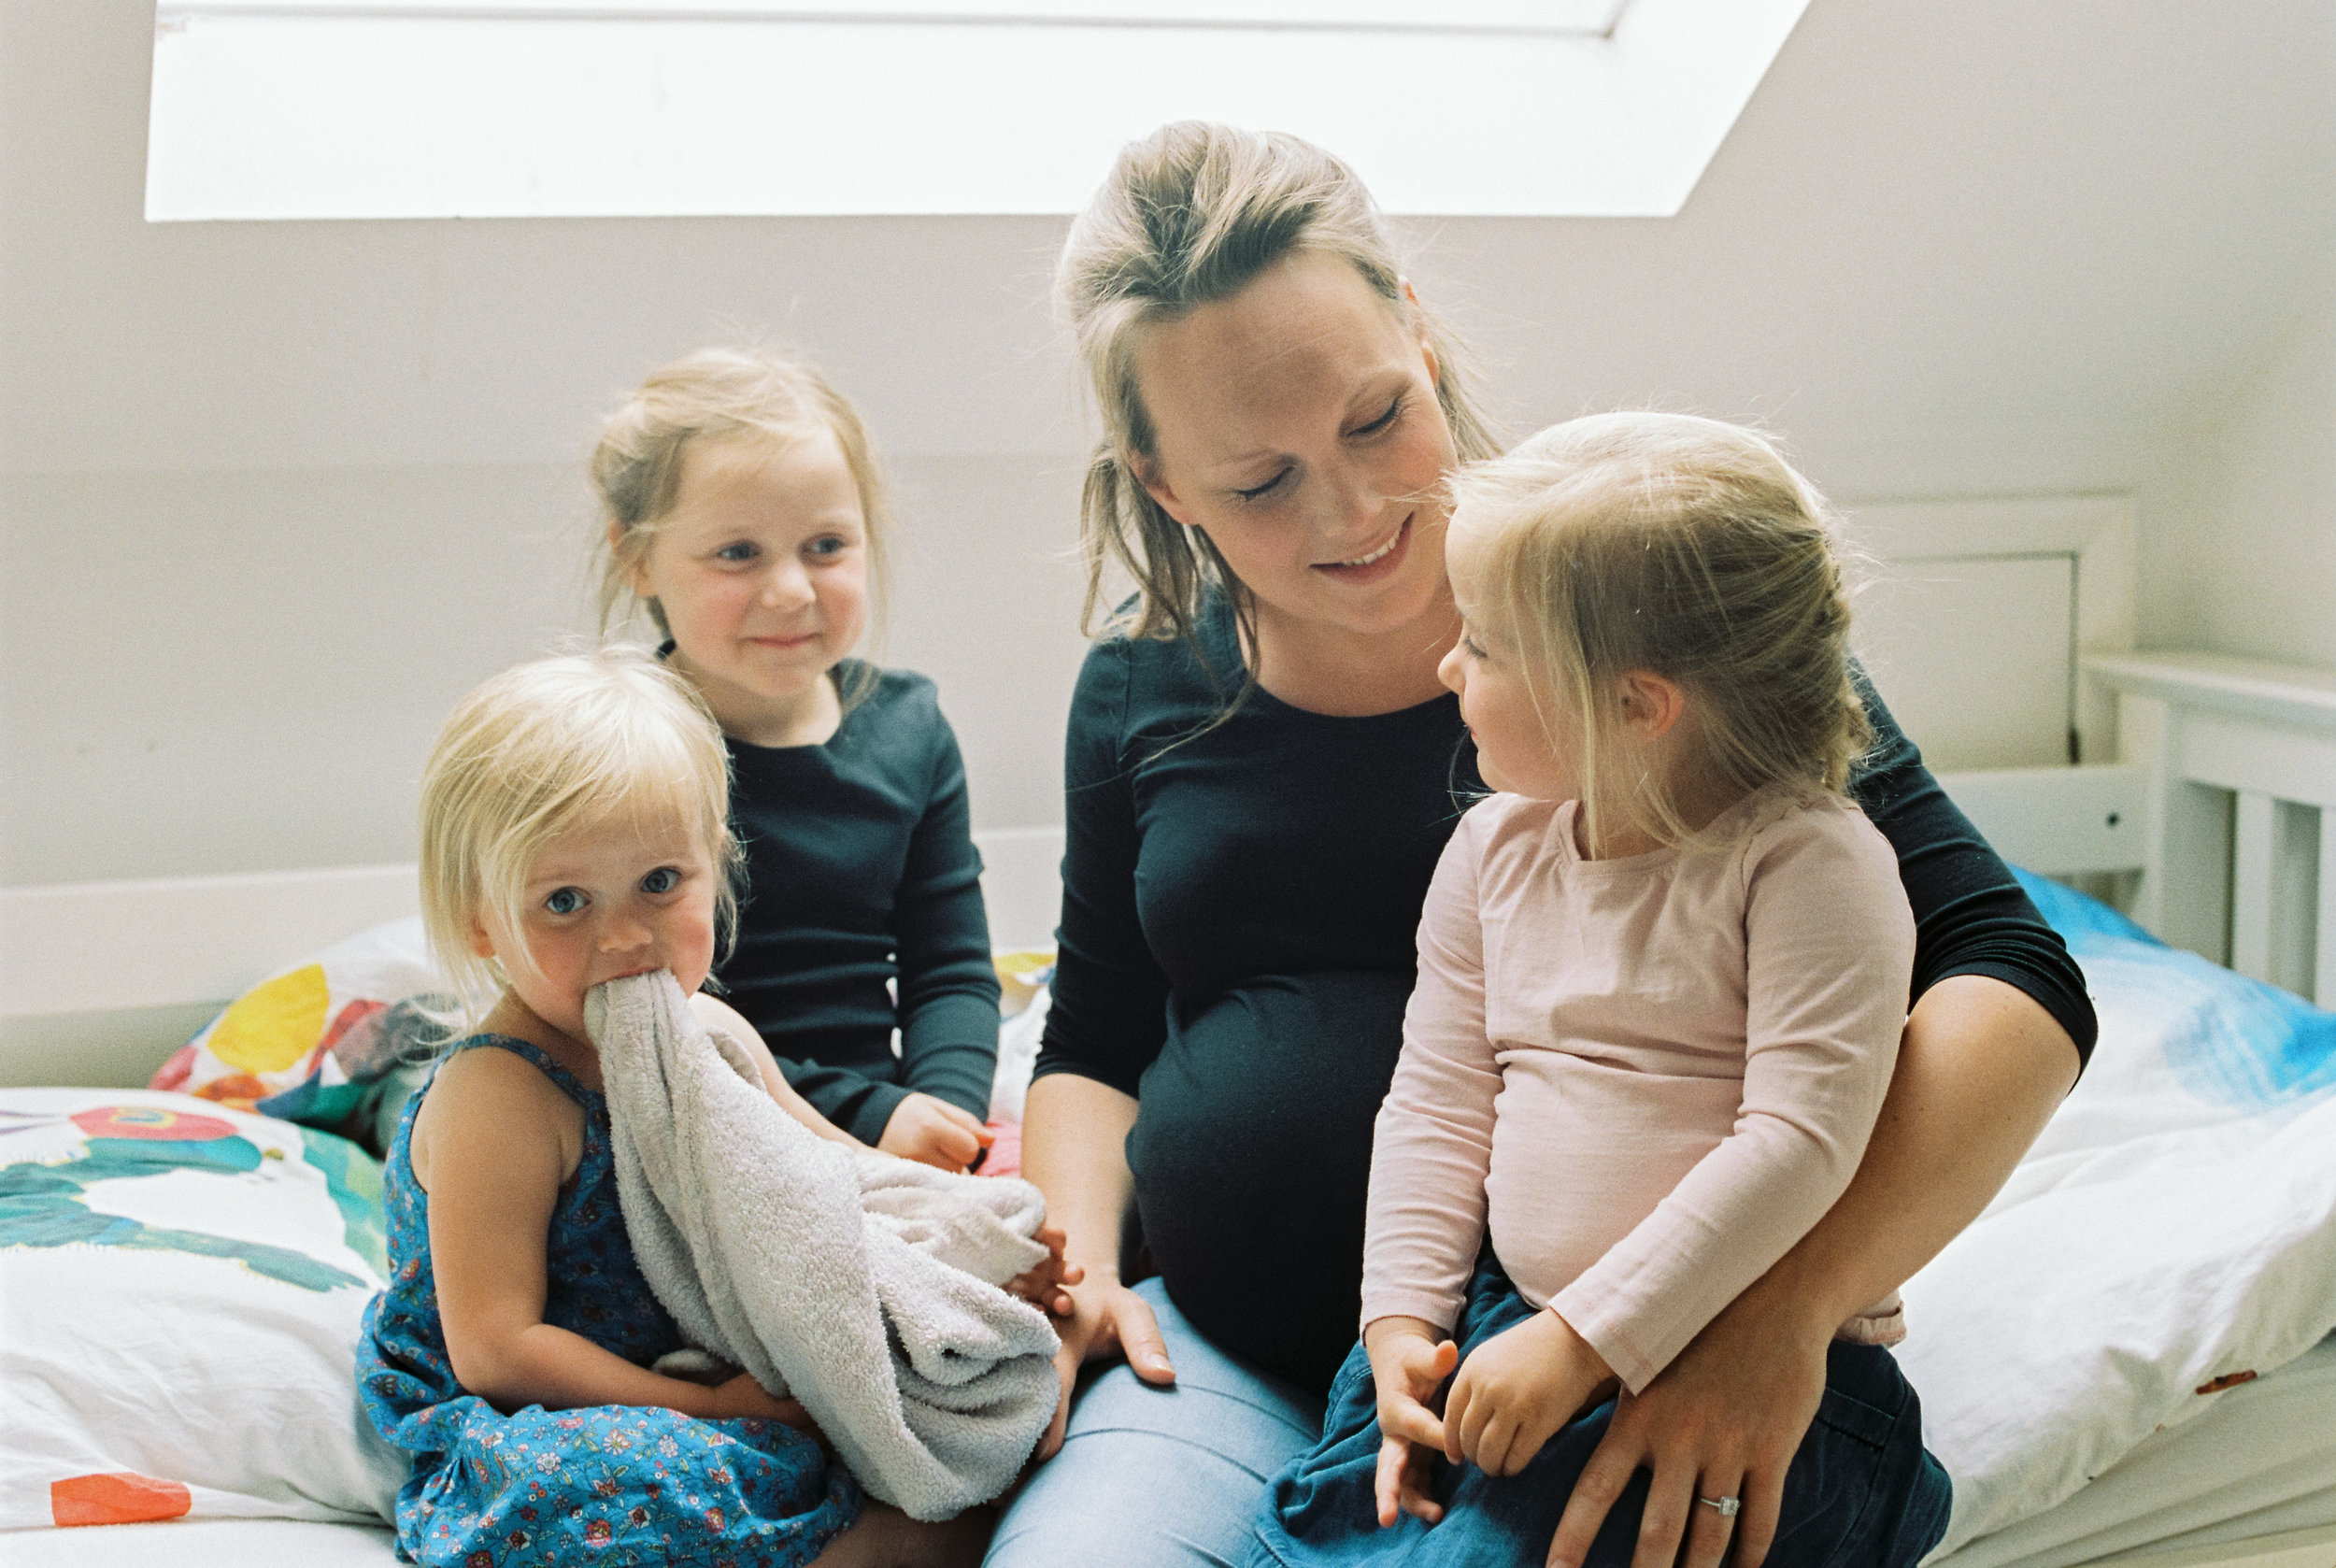 uk-film-photographer-london-family-natural-photography-62.jpg